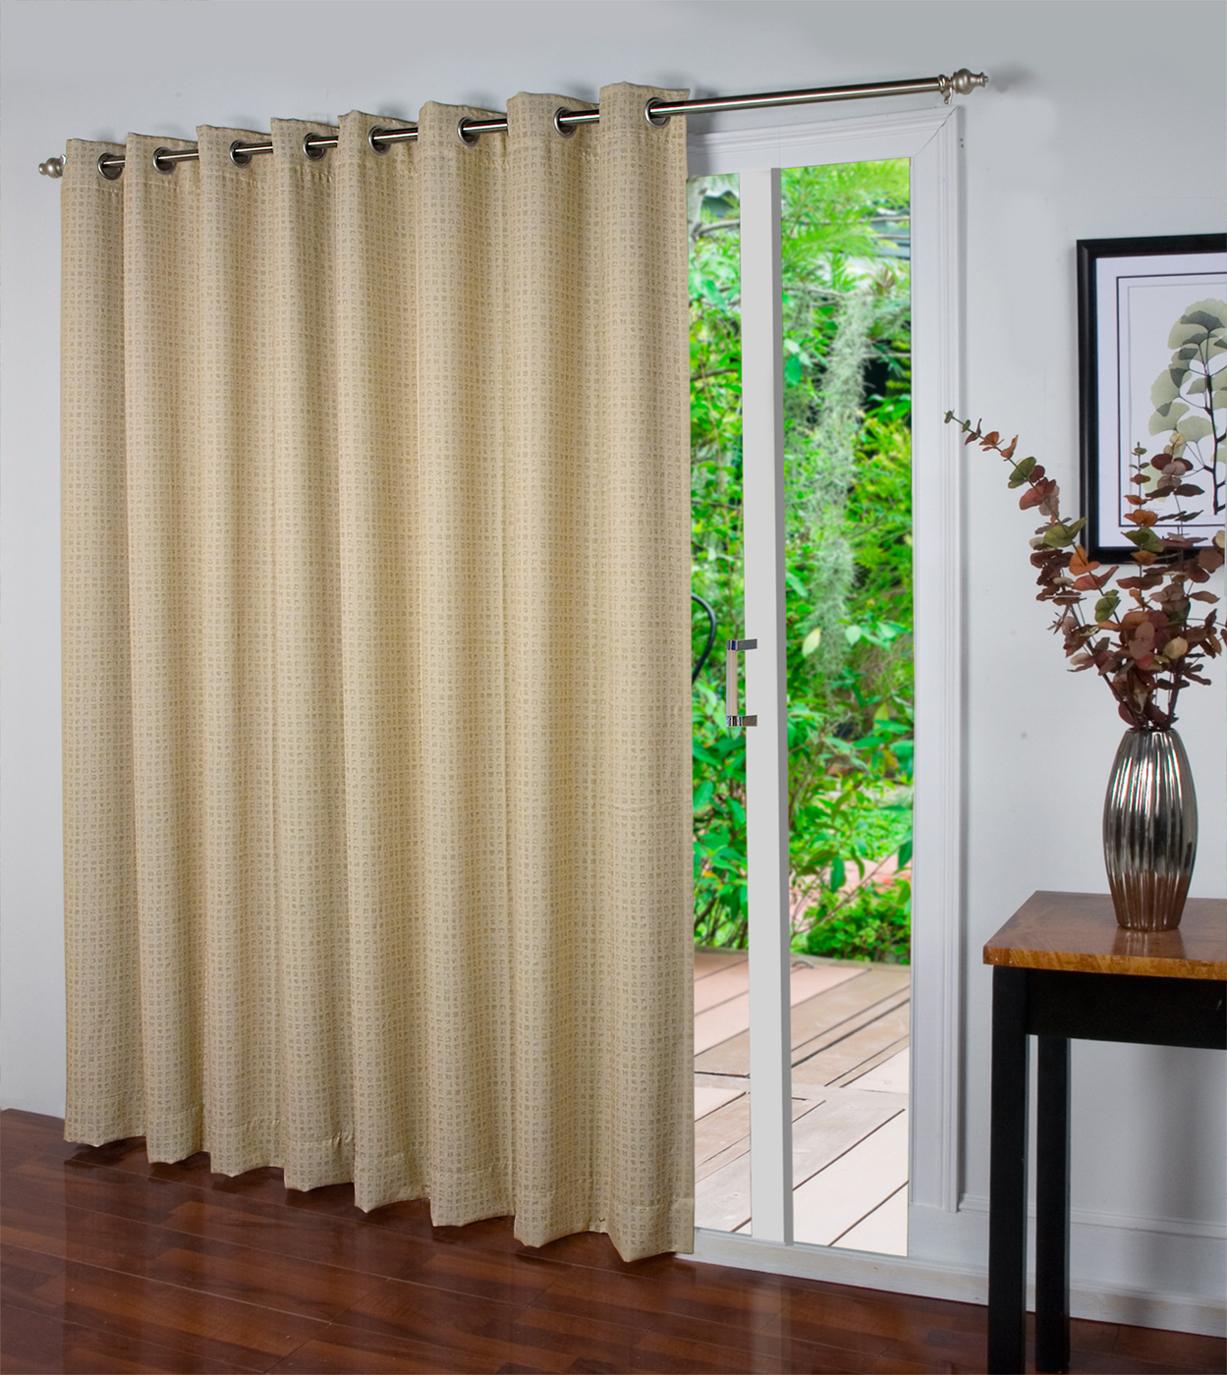 Elegant Spanish Steps Insulated Grommet Patio Panel patio door curtains